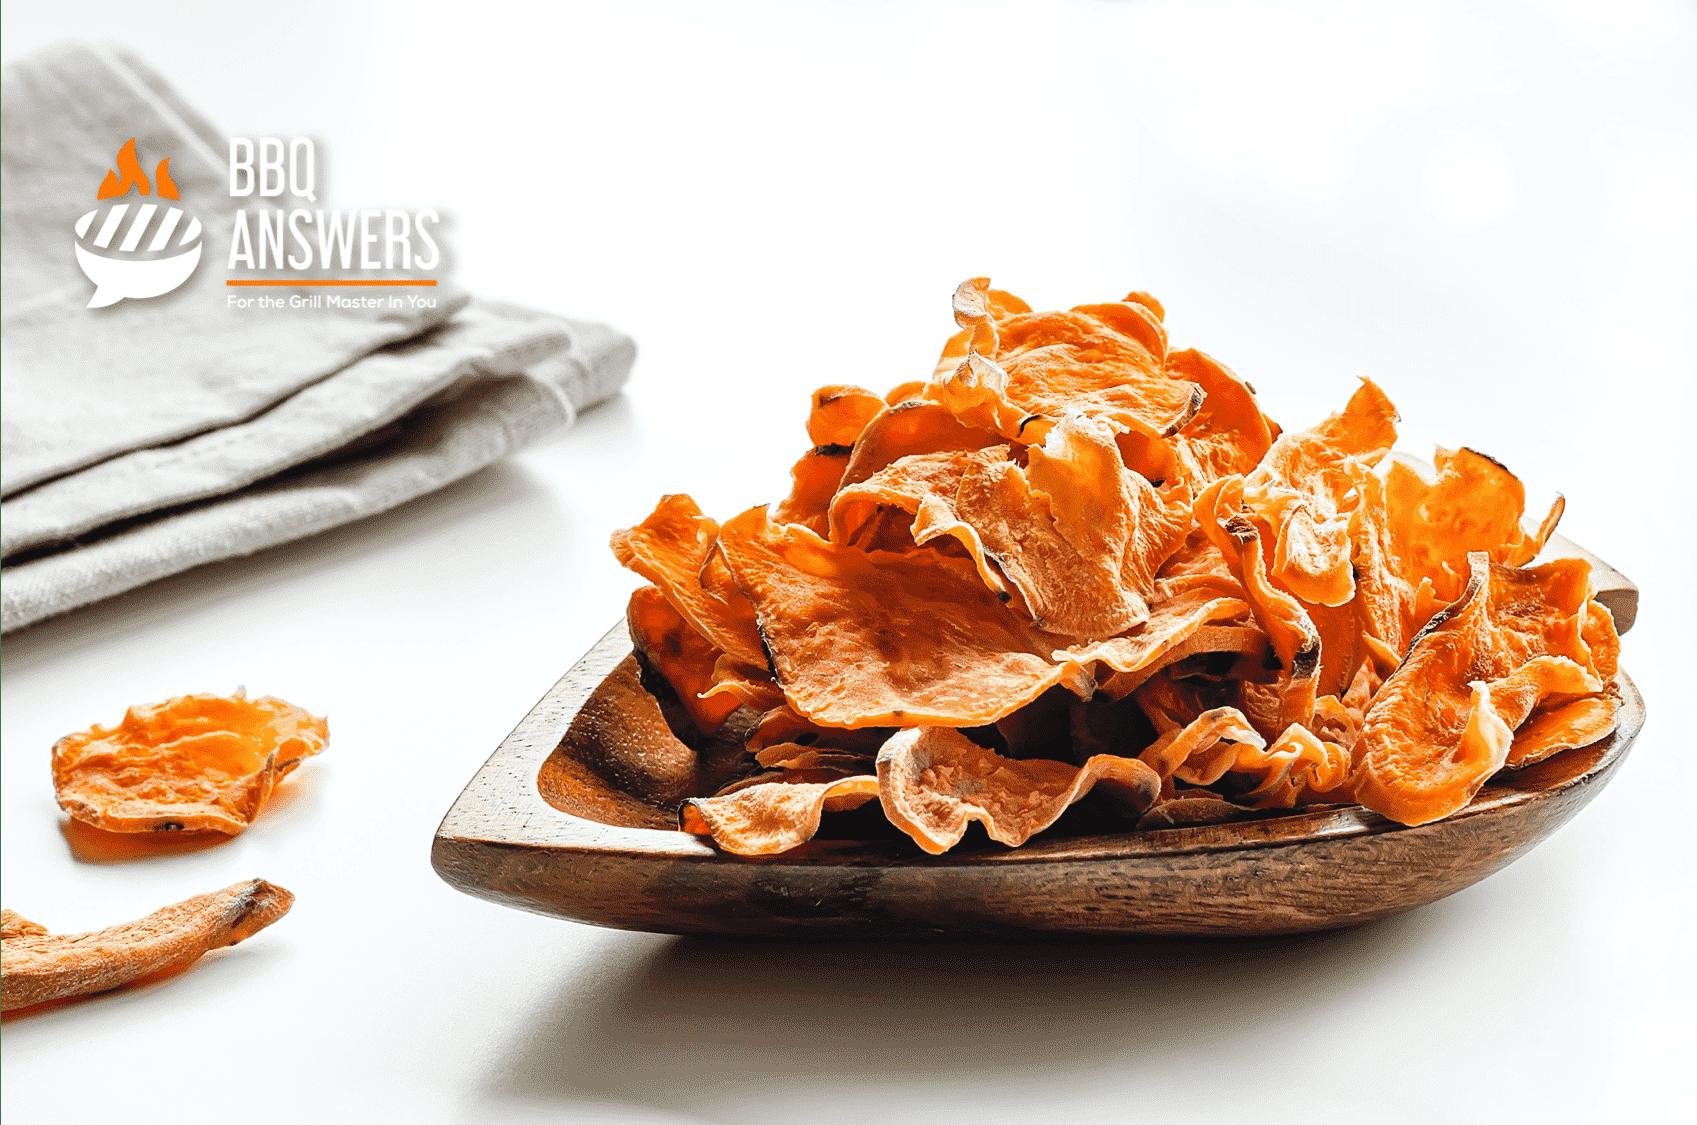 Sweet Potato Chips | Vegan BBQ Sides | BBQanswers